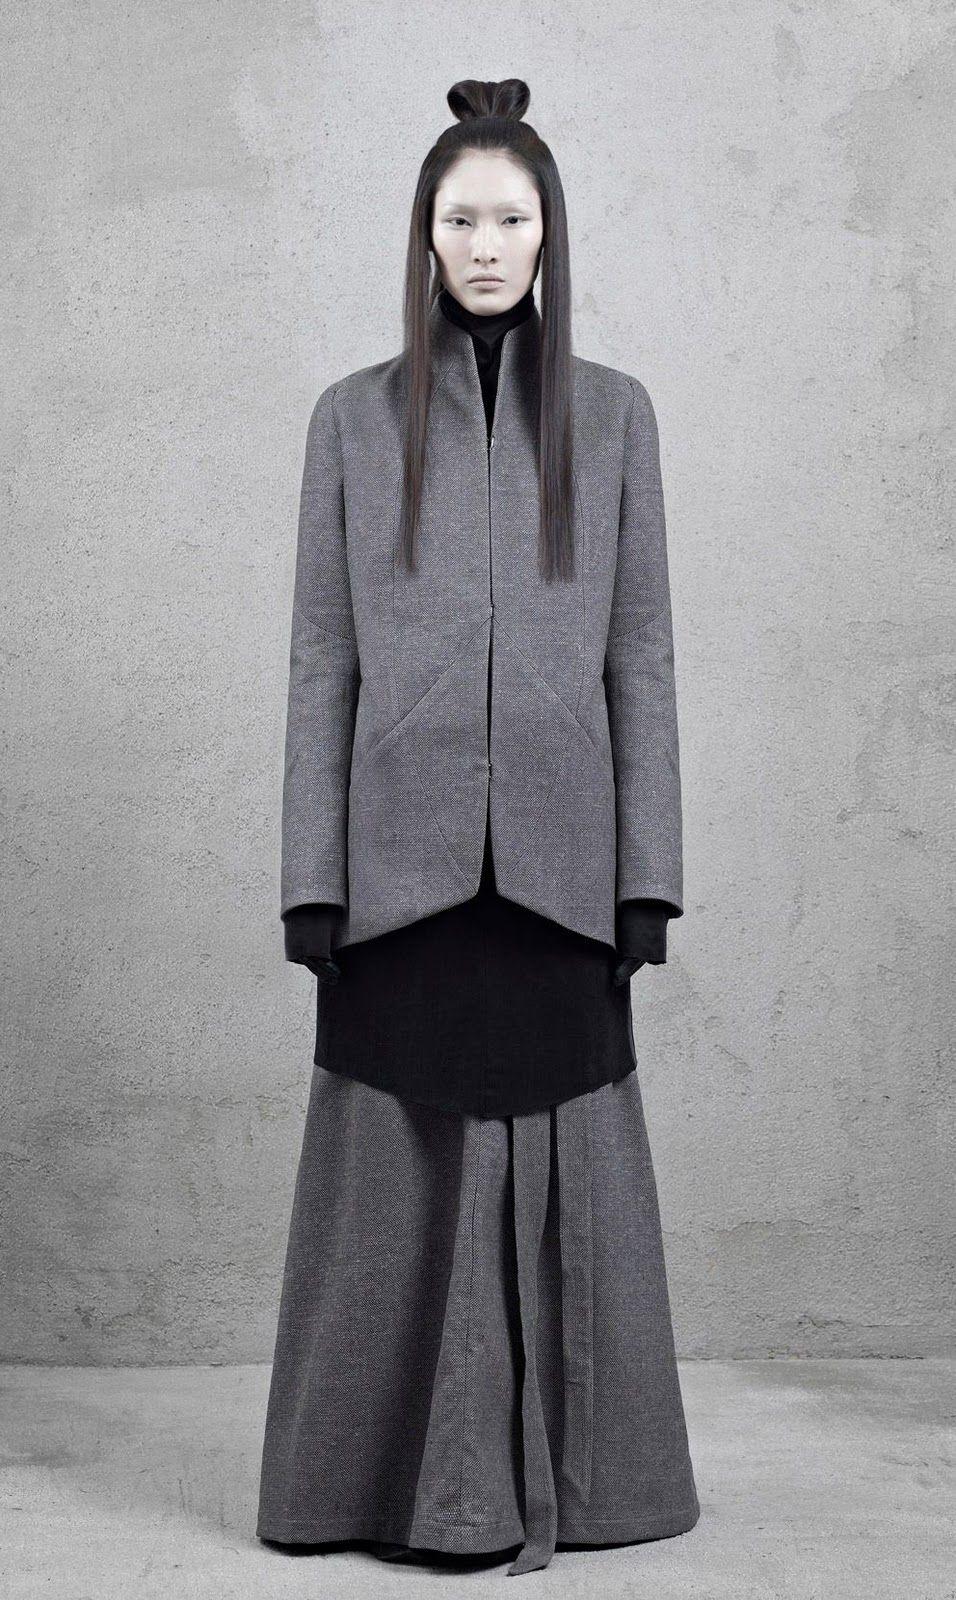 InAisce, F/W 12/13 - Fashion, Extreme fashion, Fashion design - 웹